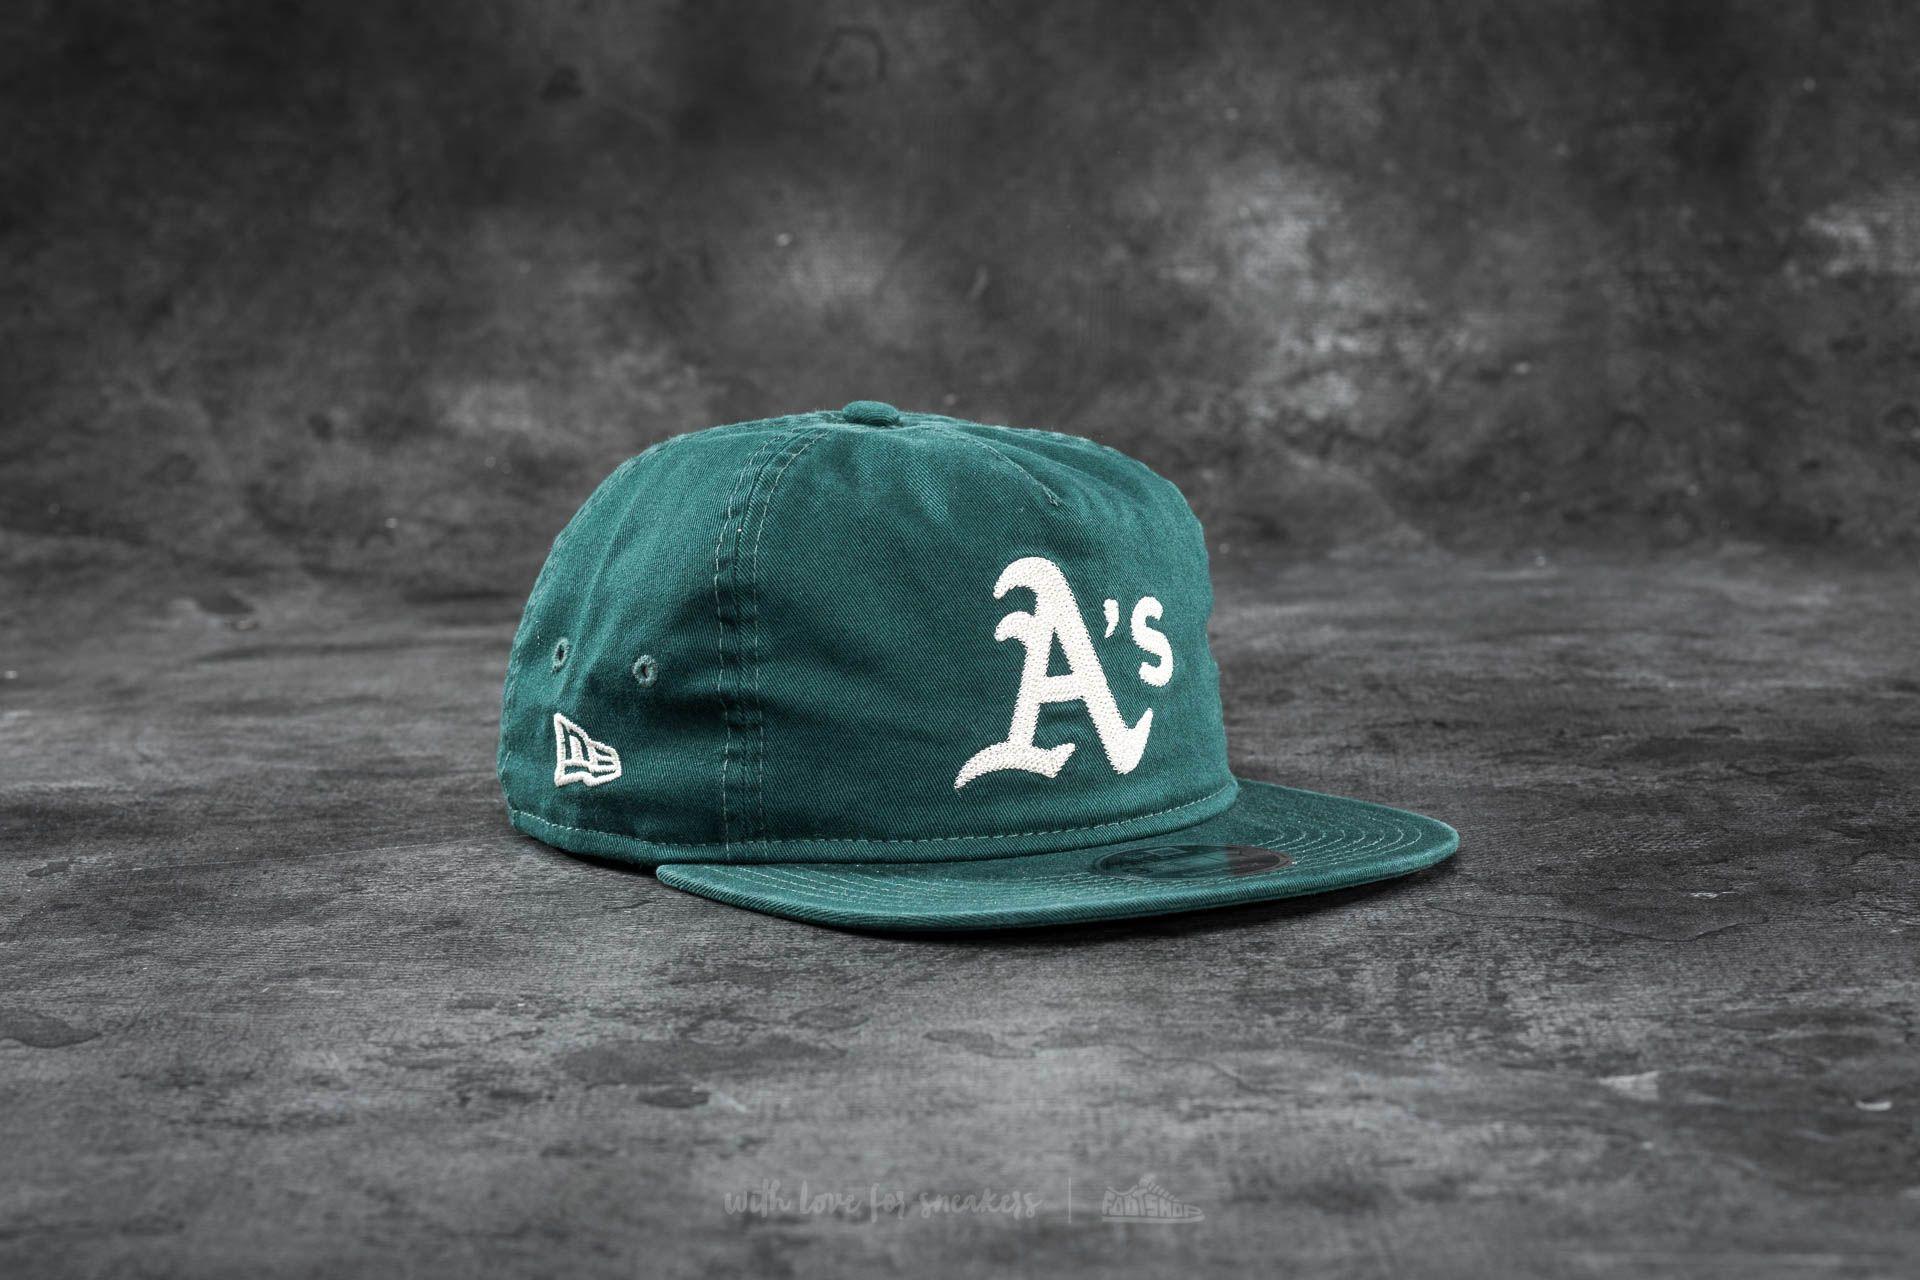 fd529010859ae New Era 9Fifty Chain Stitch Oakland Athletics Cap Dark Green ...